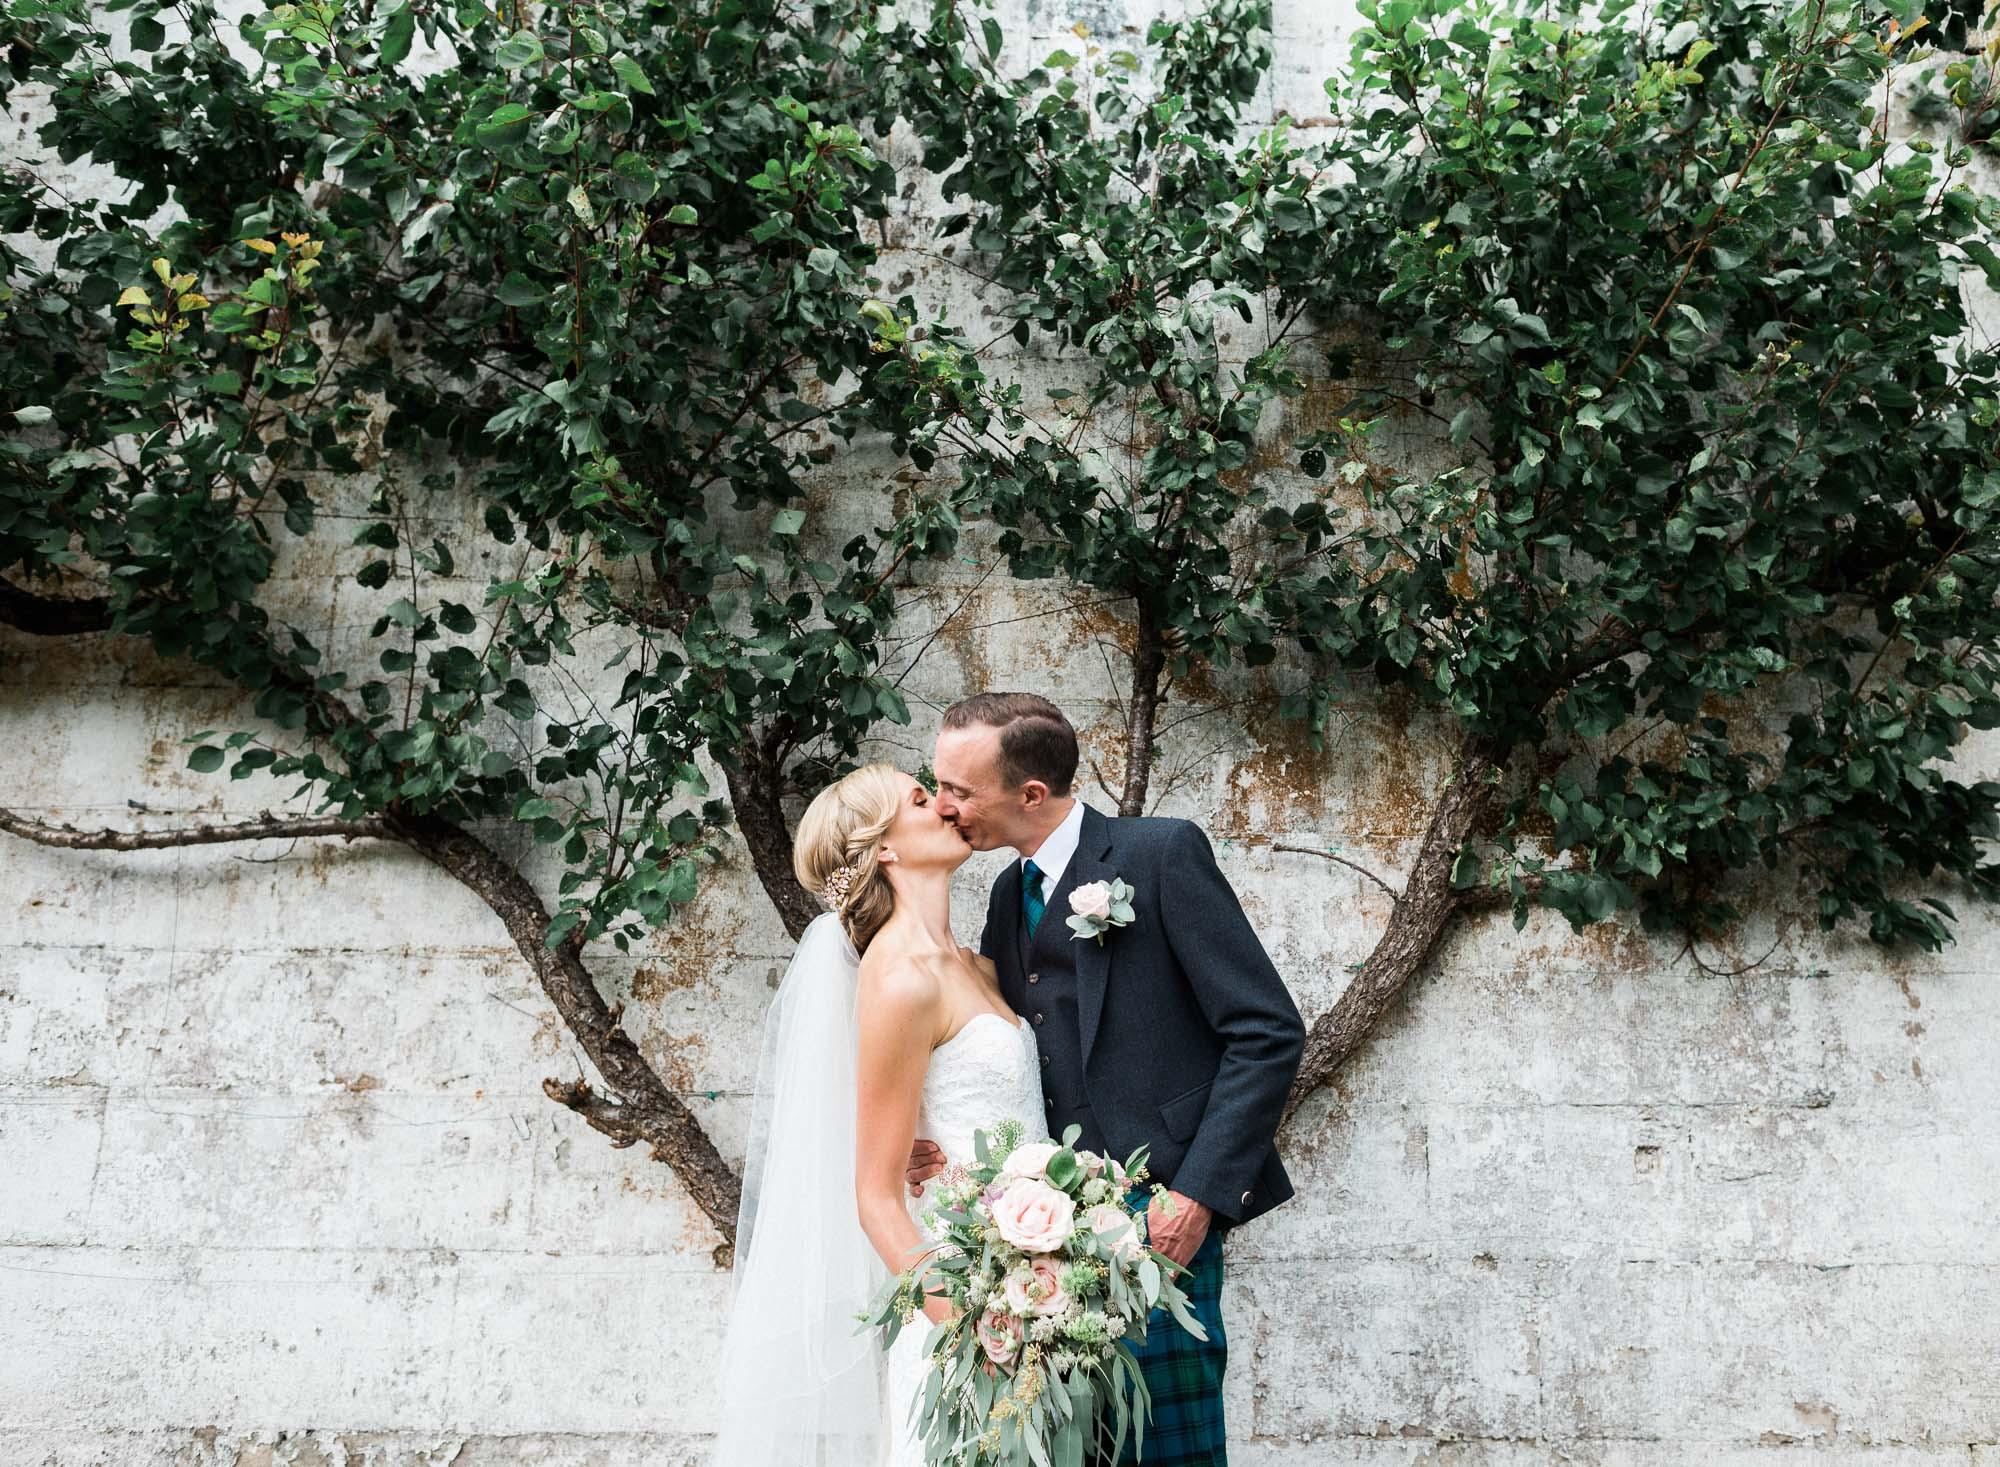 scottish_wedding_blairquhan_castle-51.jpg